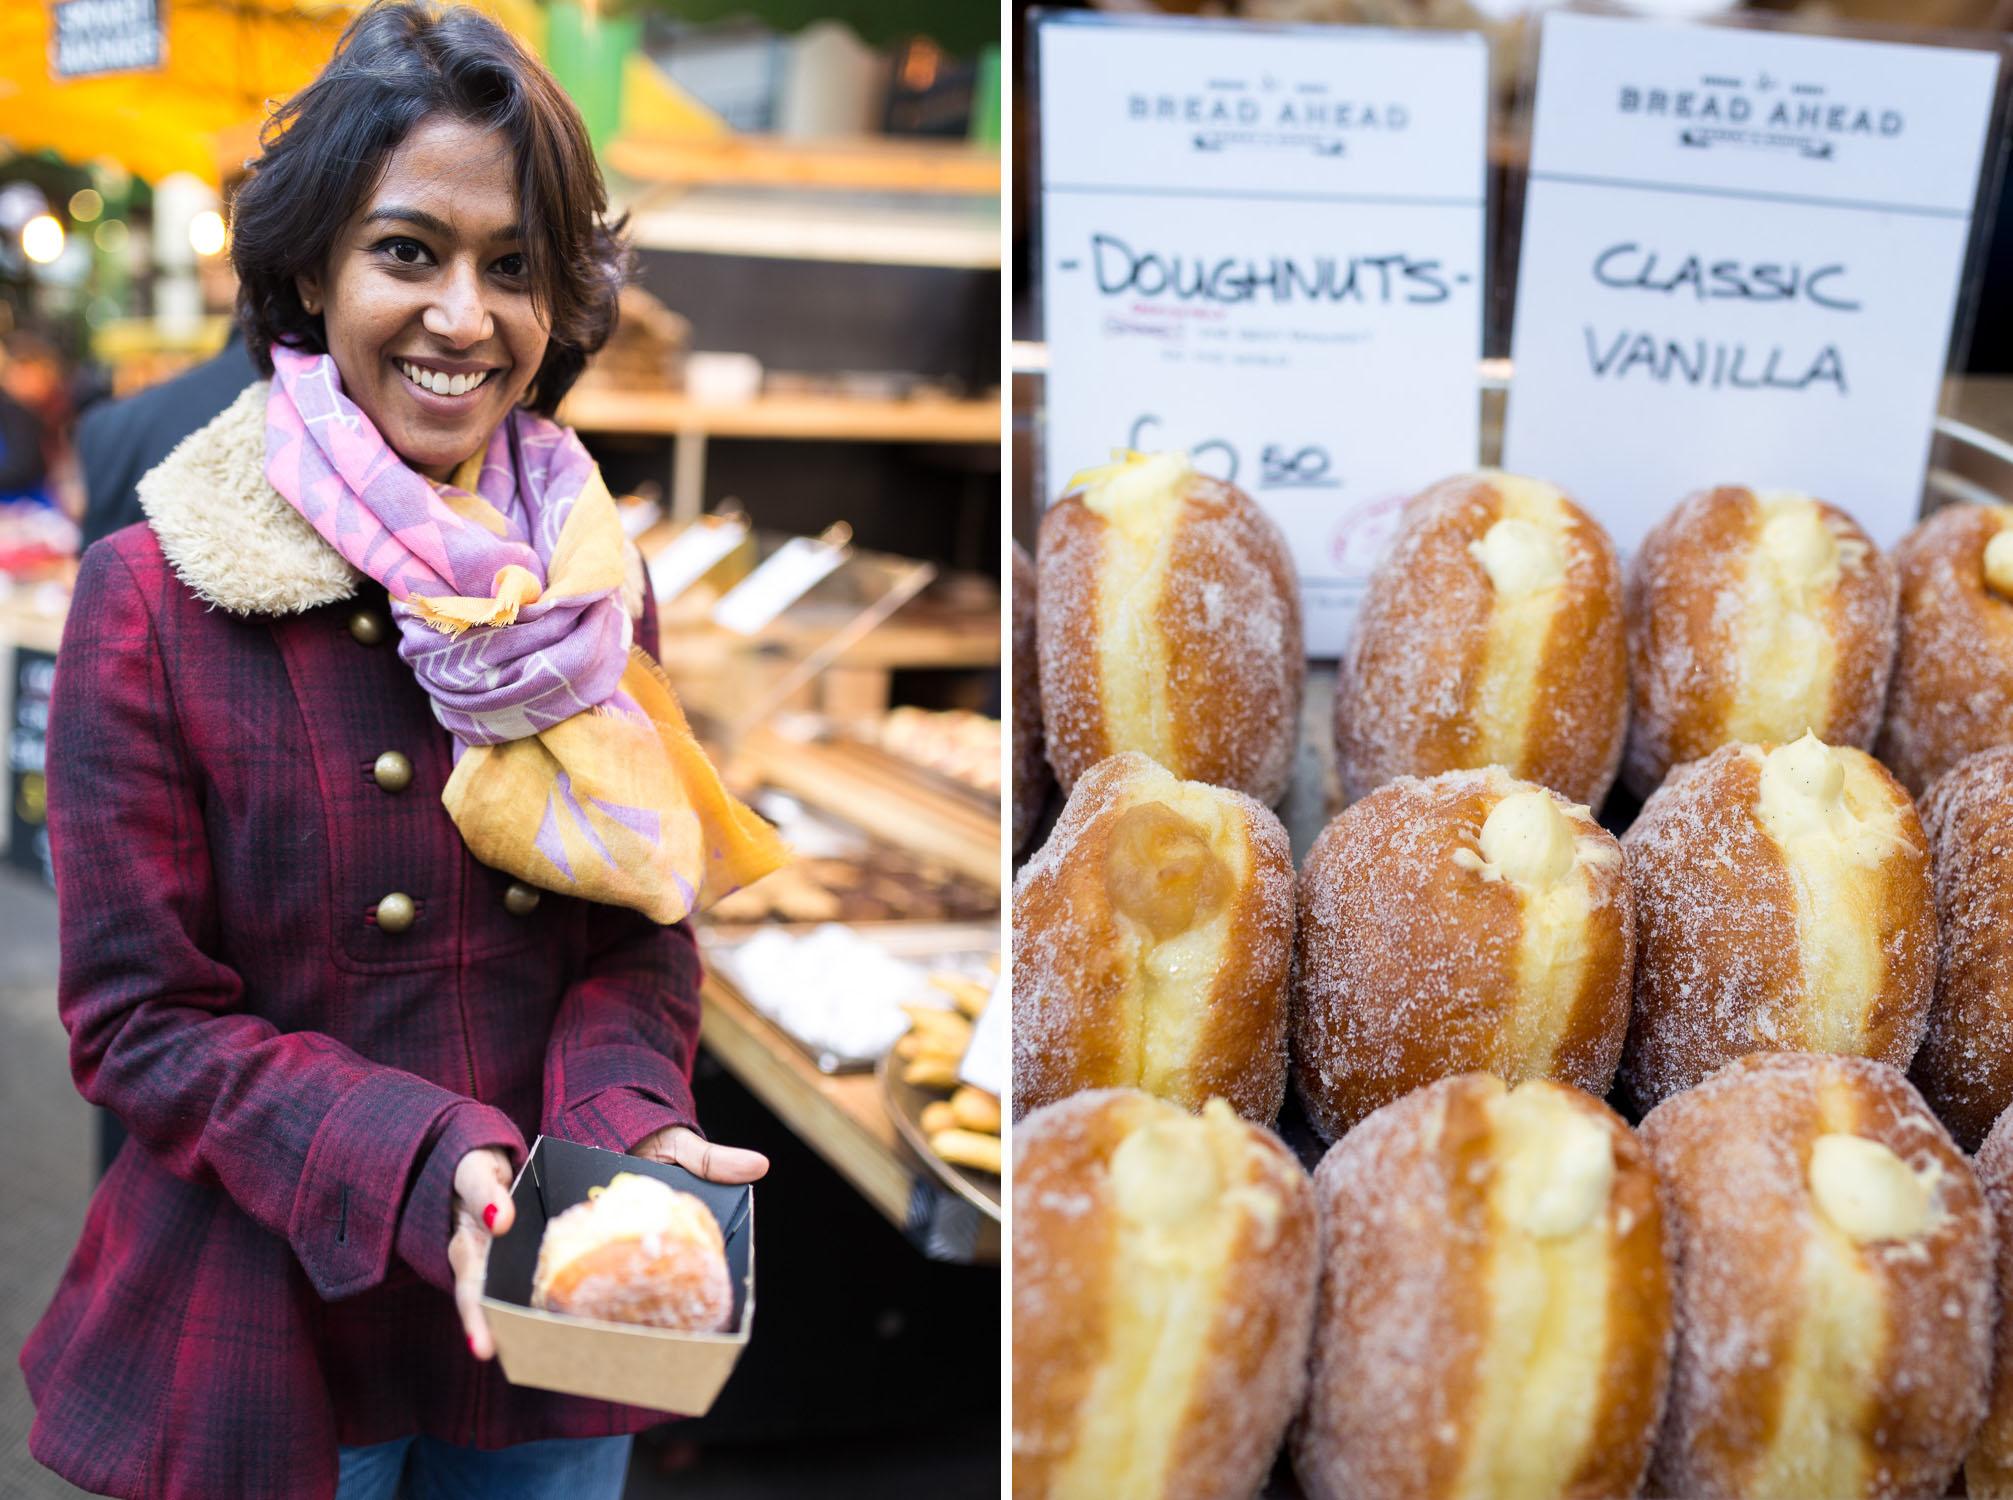 Borough-Market-Bread-Ahead-Doughnuts